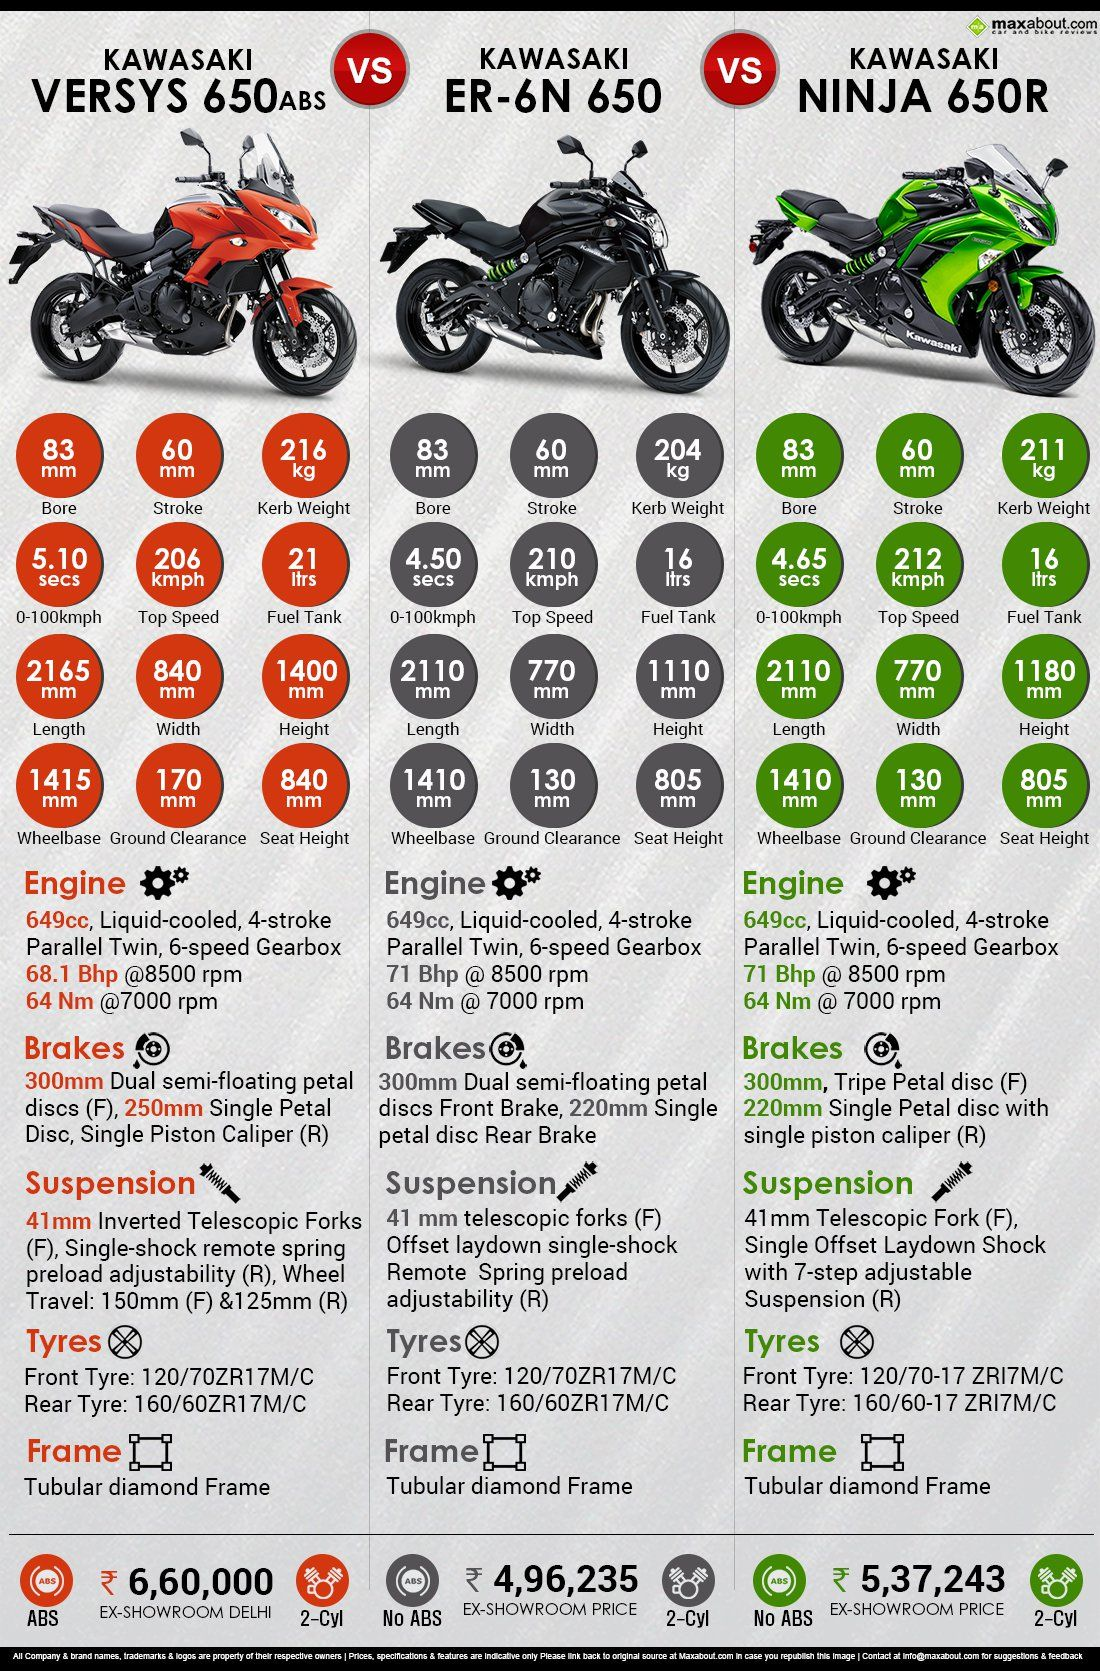 Quick Comparison Of 650cc Kawasaki Motorcycles Er 6n Vs Ninja Vs